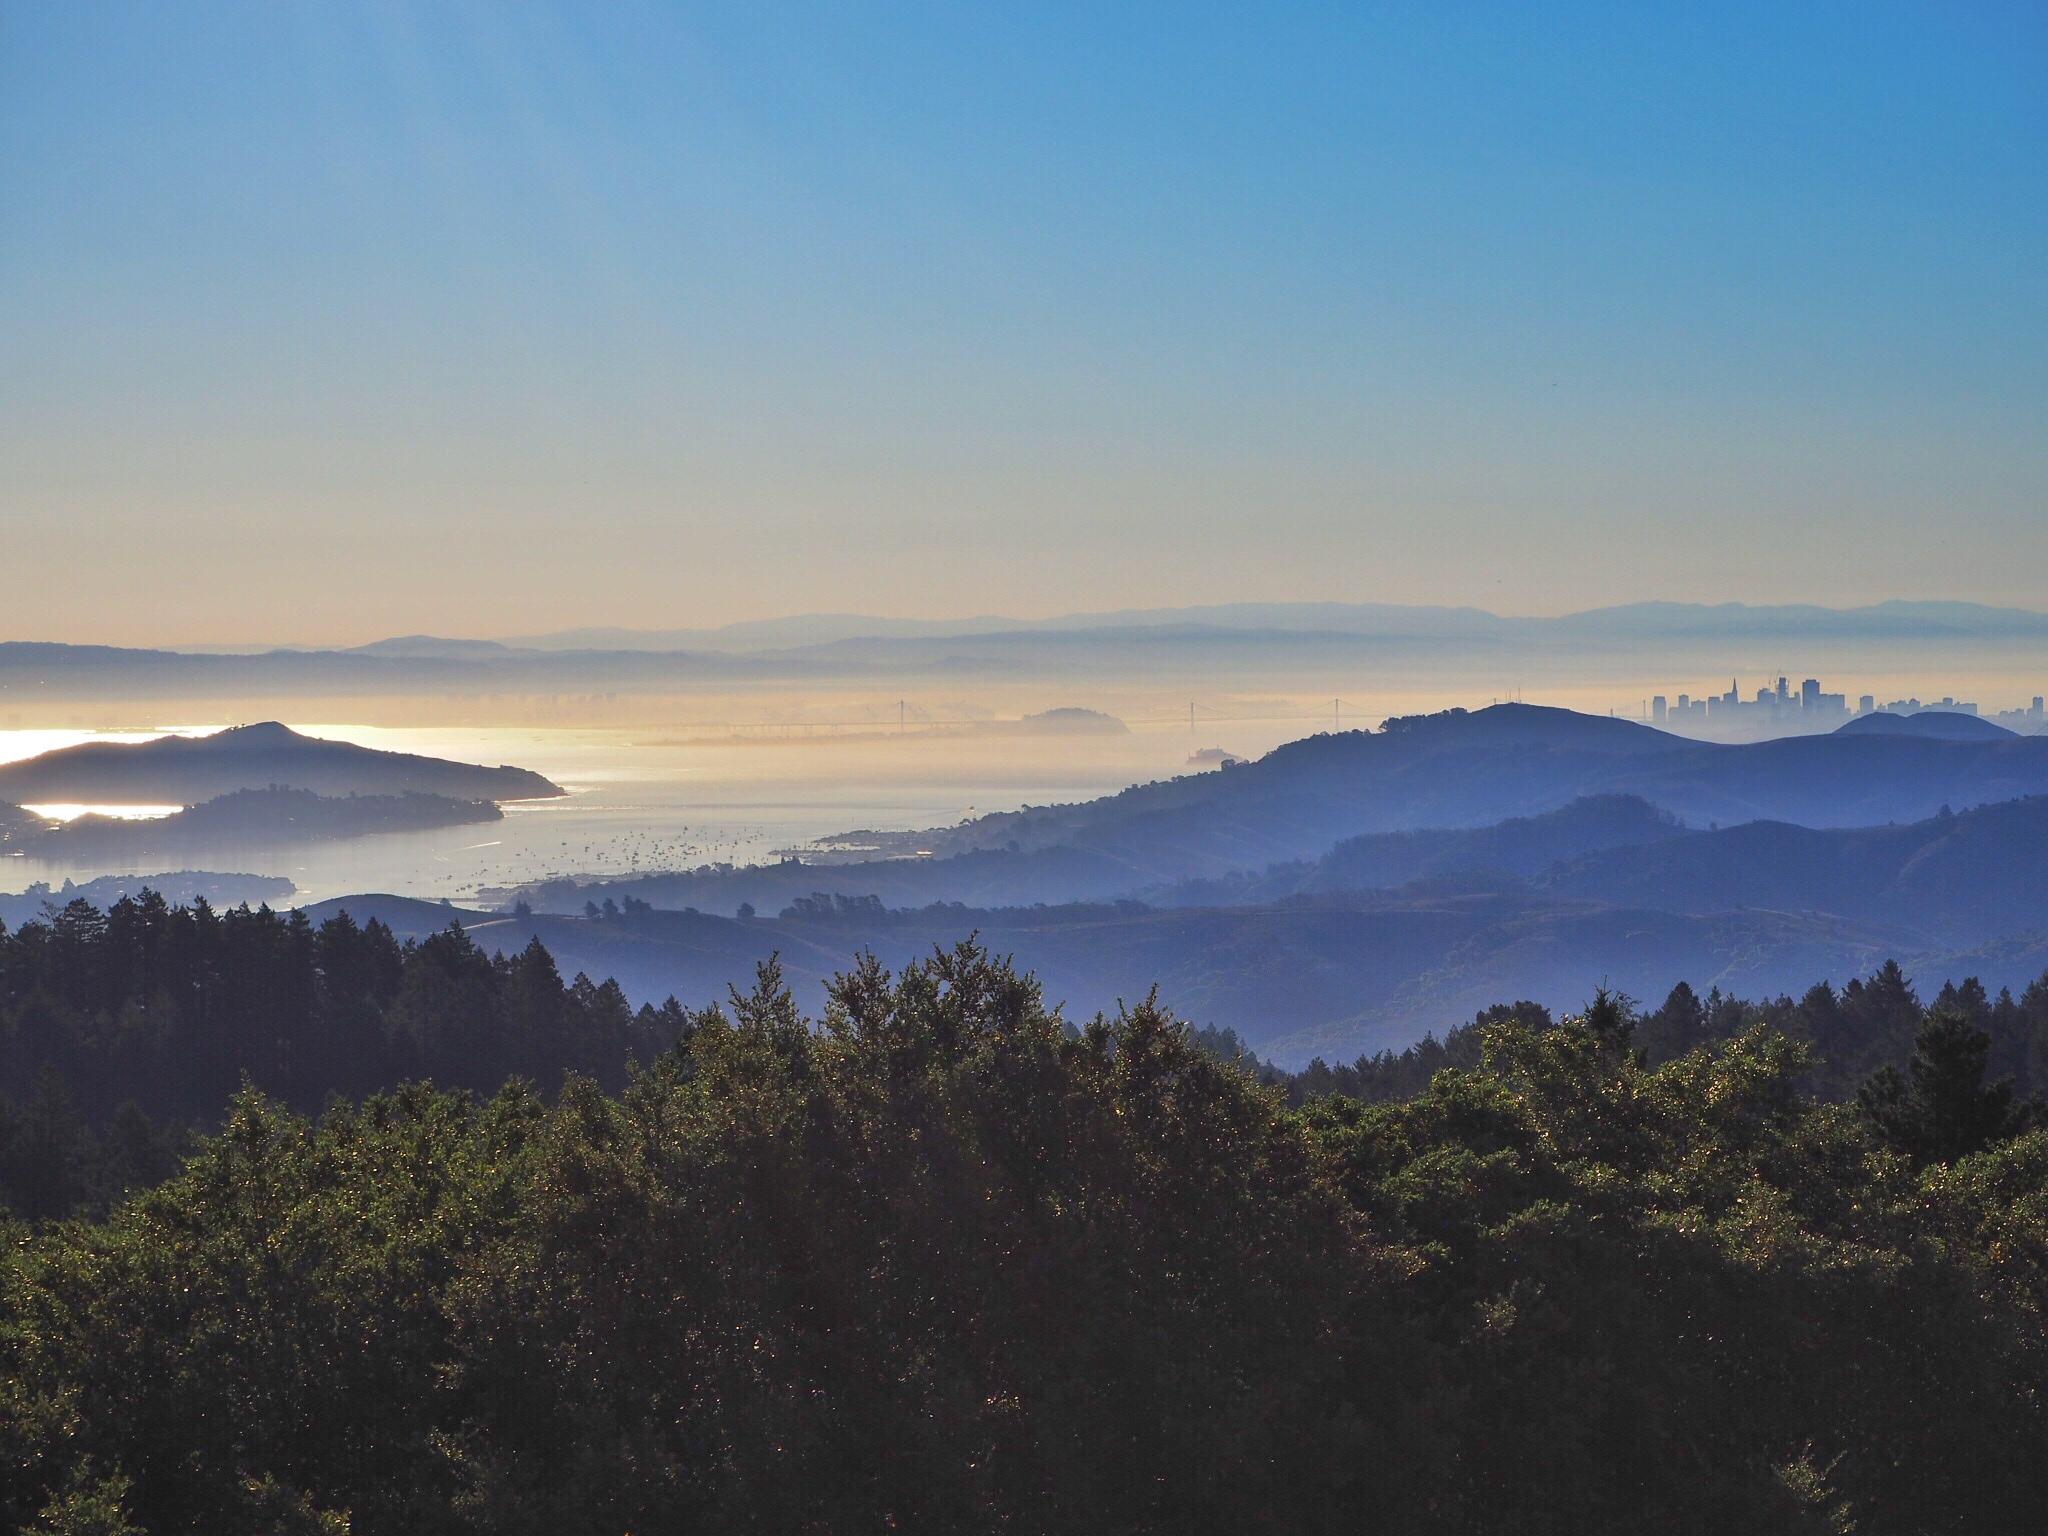 Sunrise overlooking San Francisco and The Golden Gate Bridge